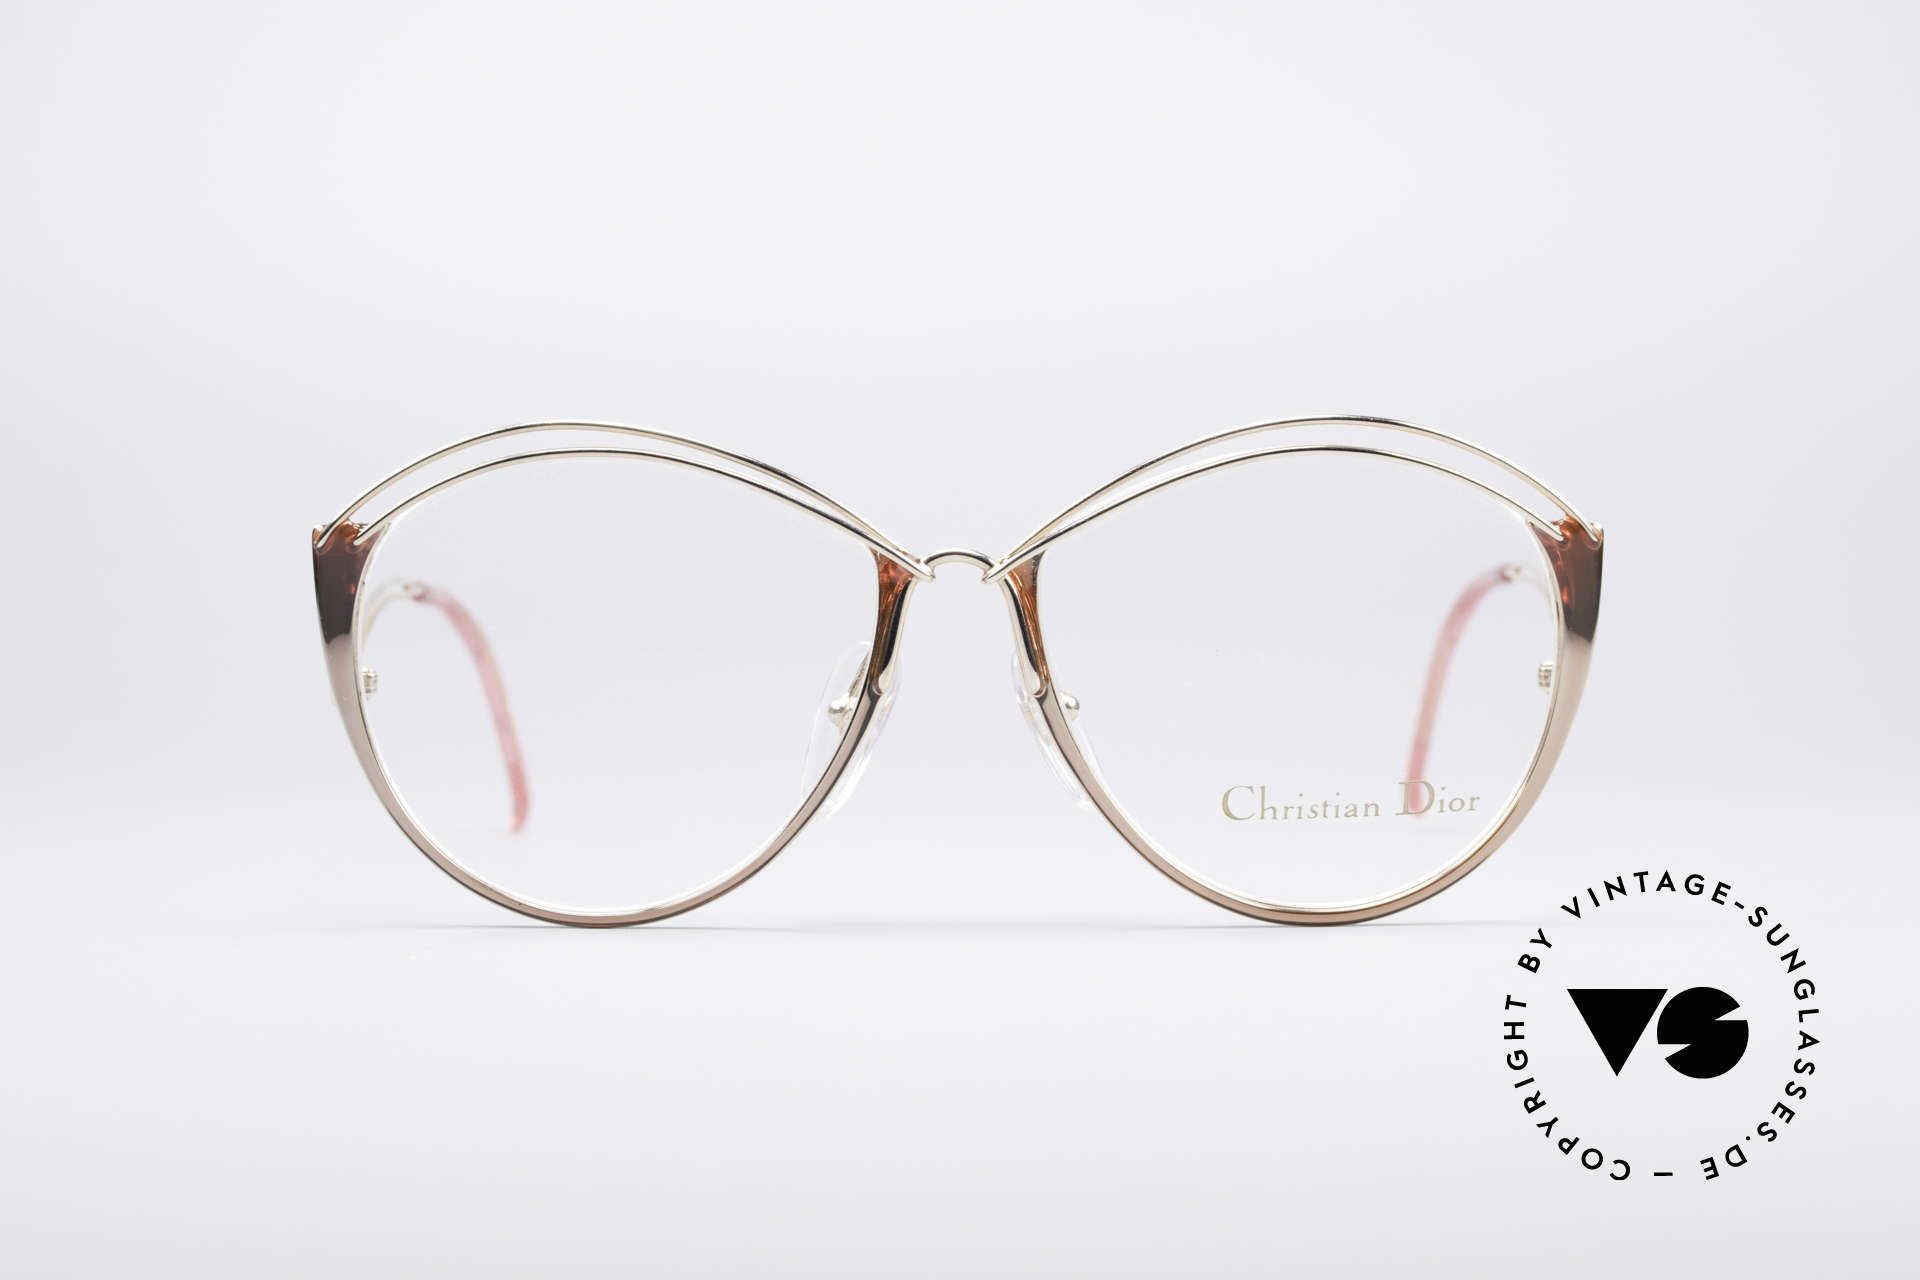 d20757119e Glasses Christian Dior 2535 90 s Ladies Frame